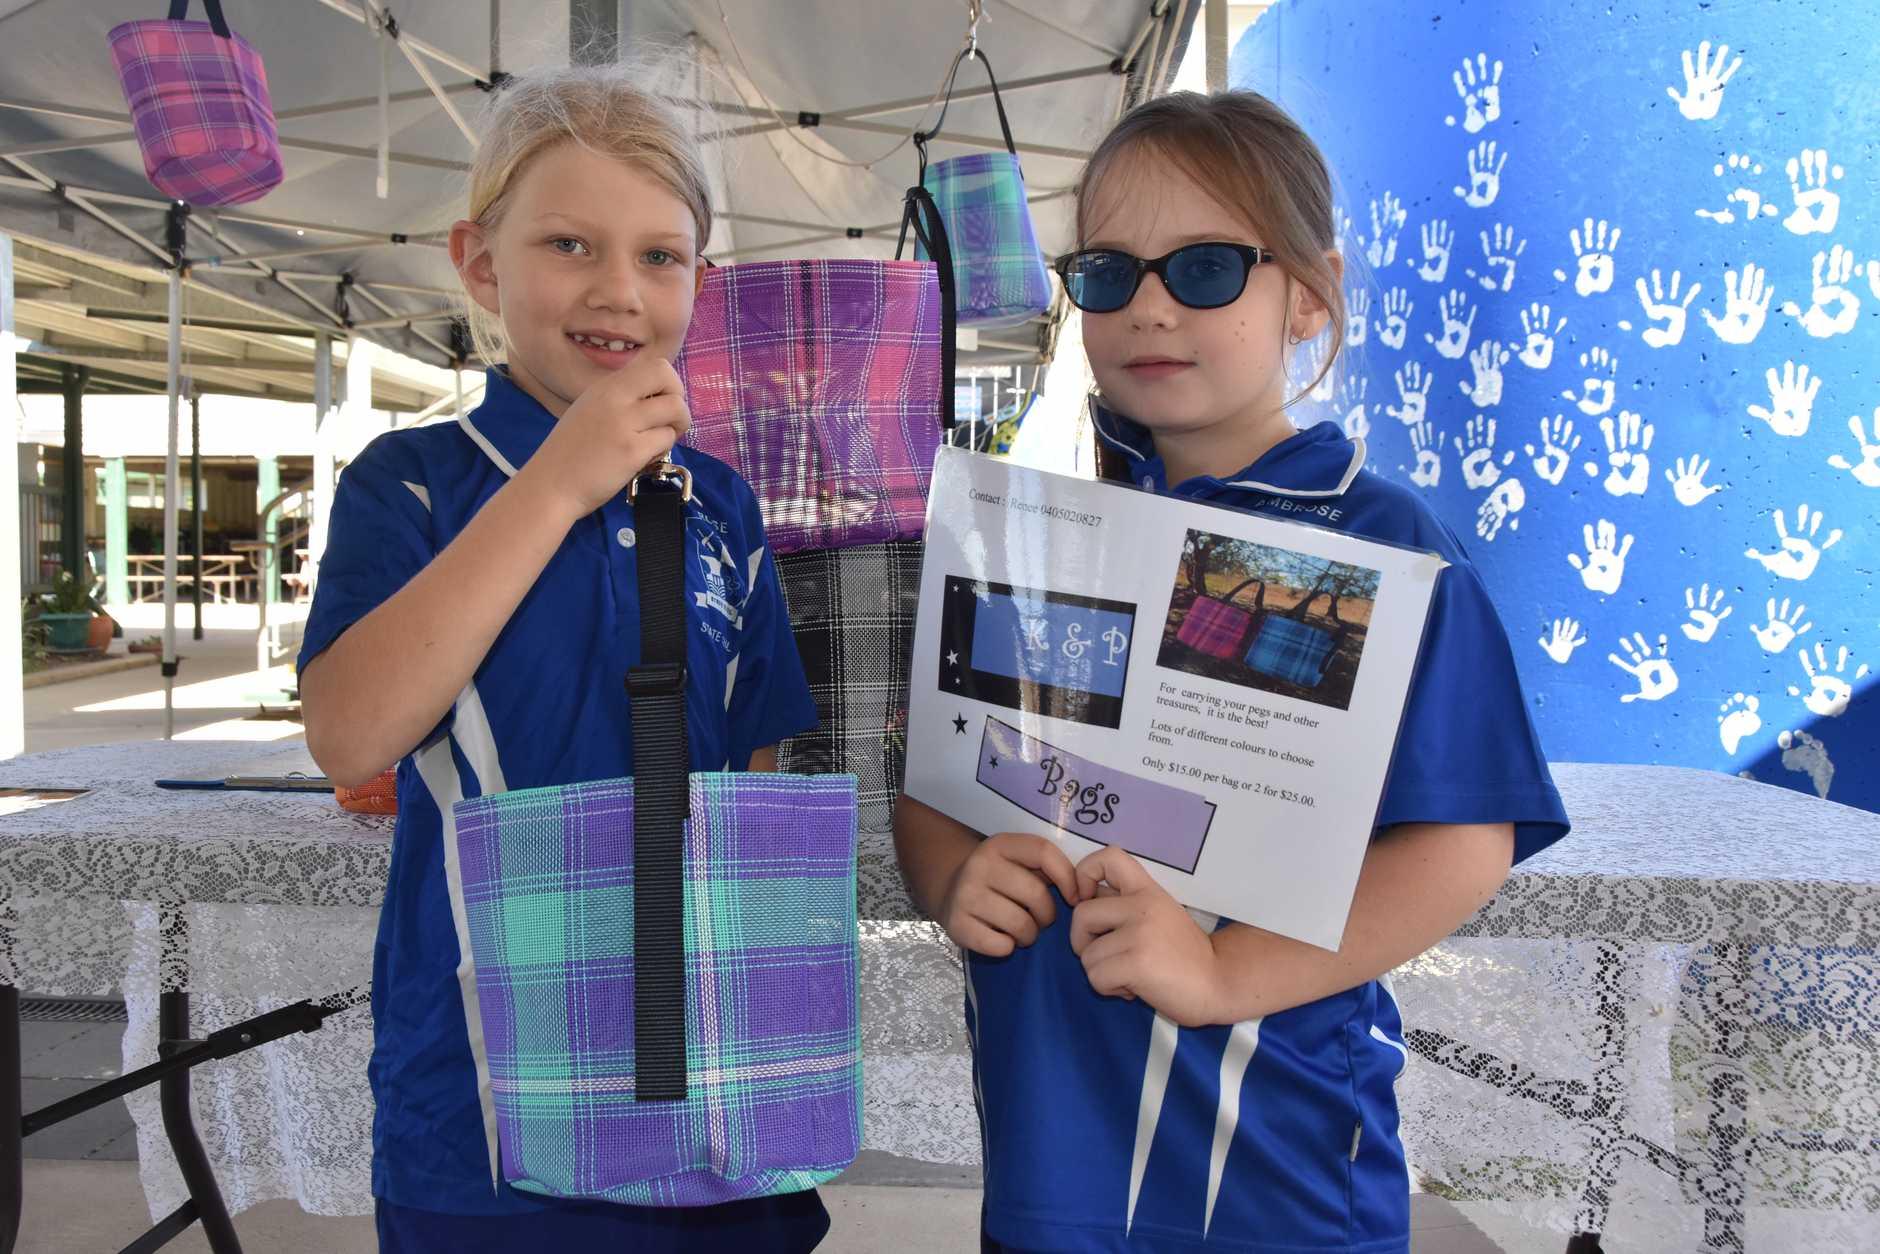 Katie Birthisel, 7 and Phoenix Watson, 7 with their amazing peg basket product.